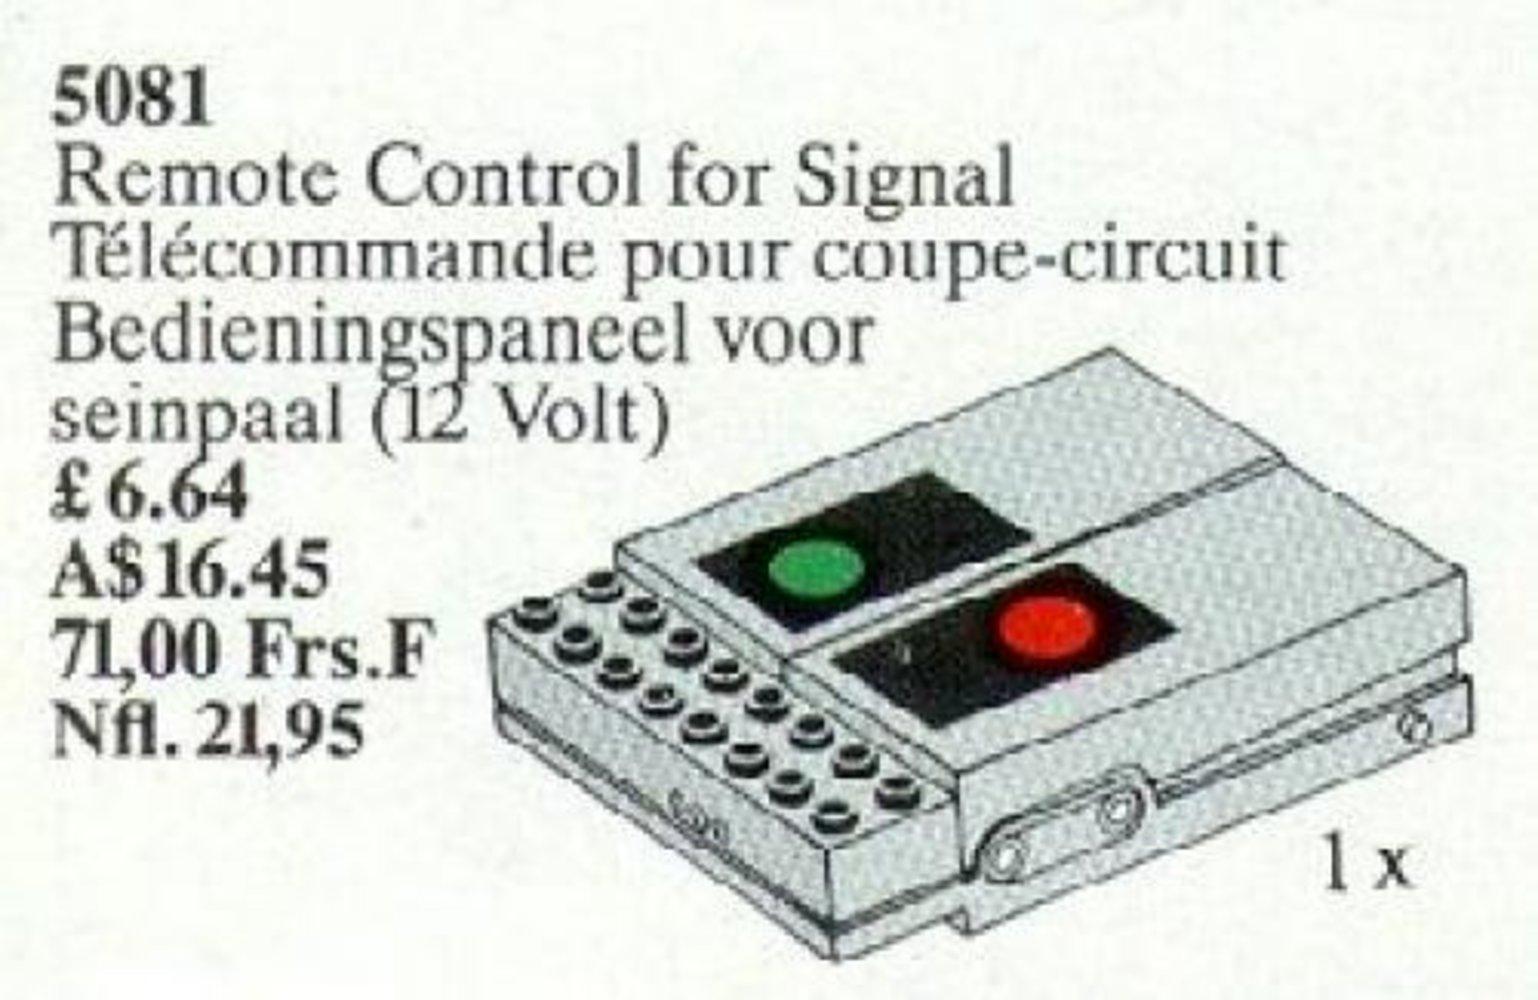 Remote Control for Signal